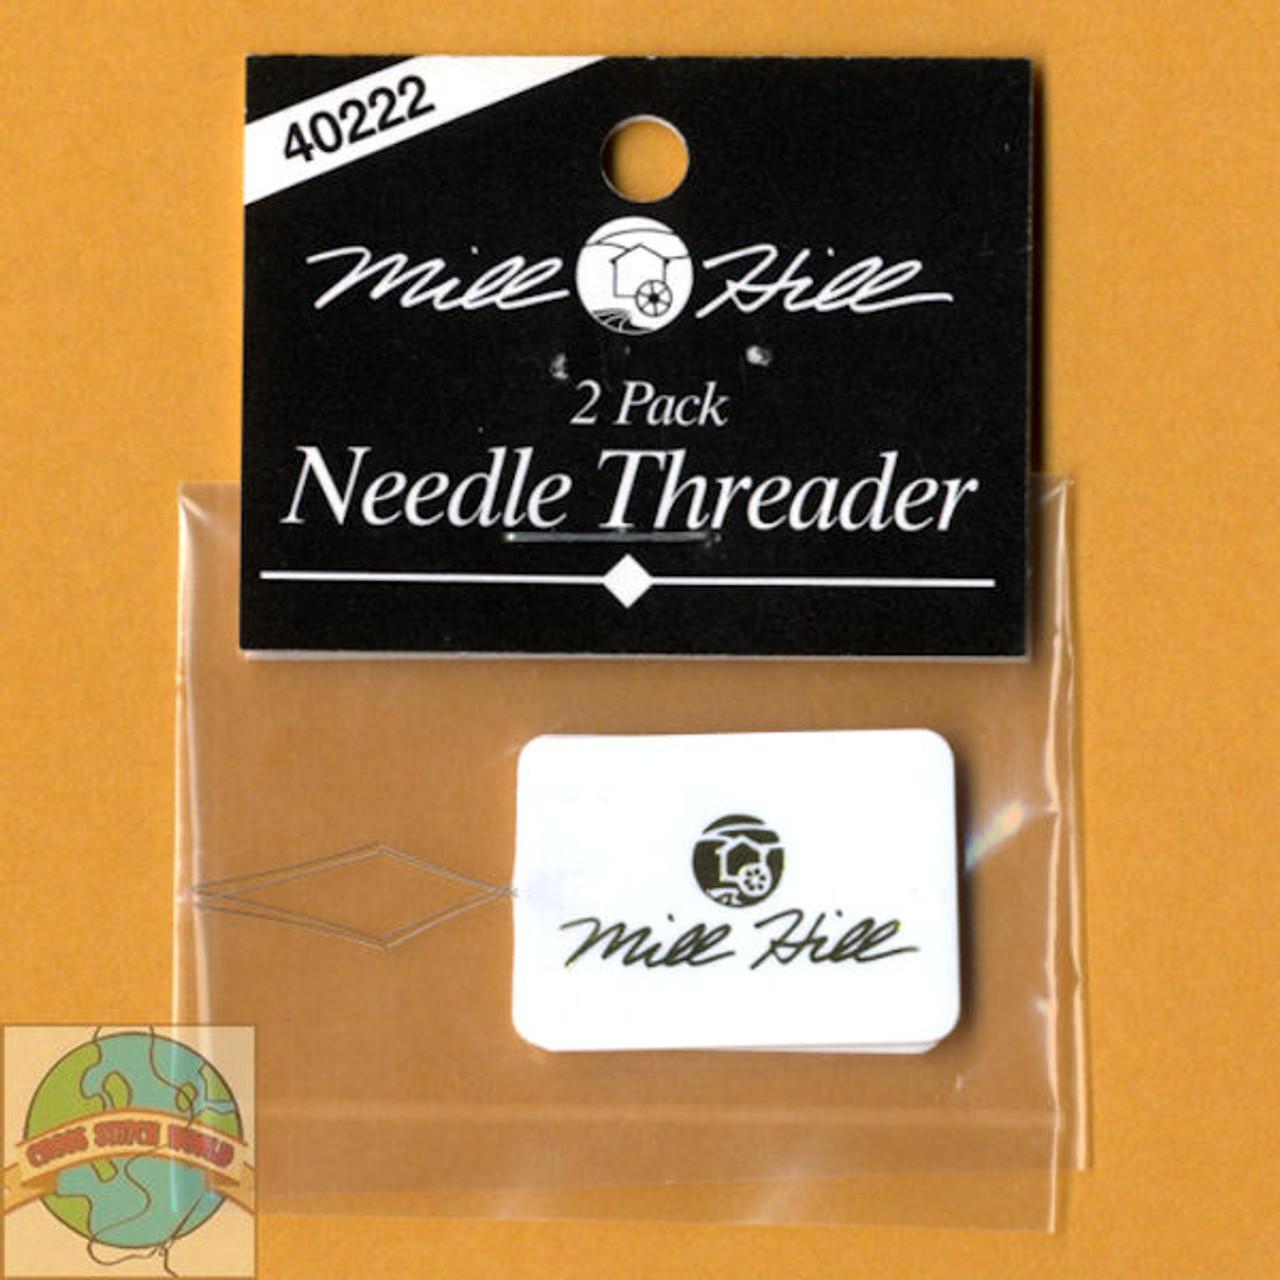 Mill Hill Needle Threader 2 Pack